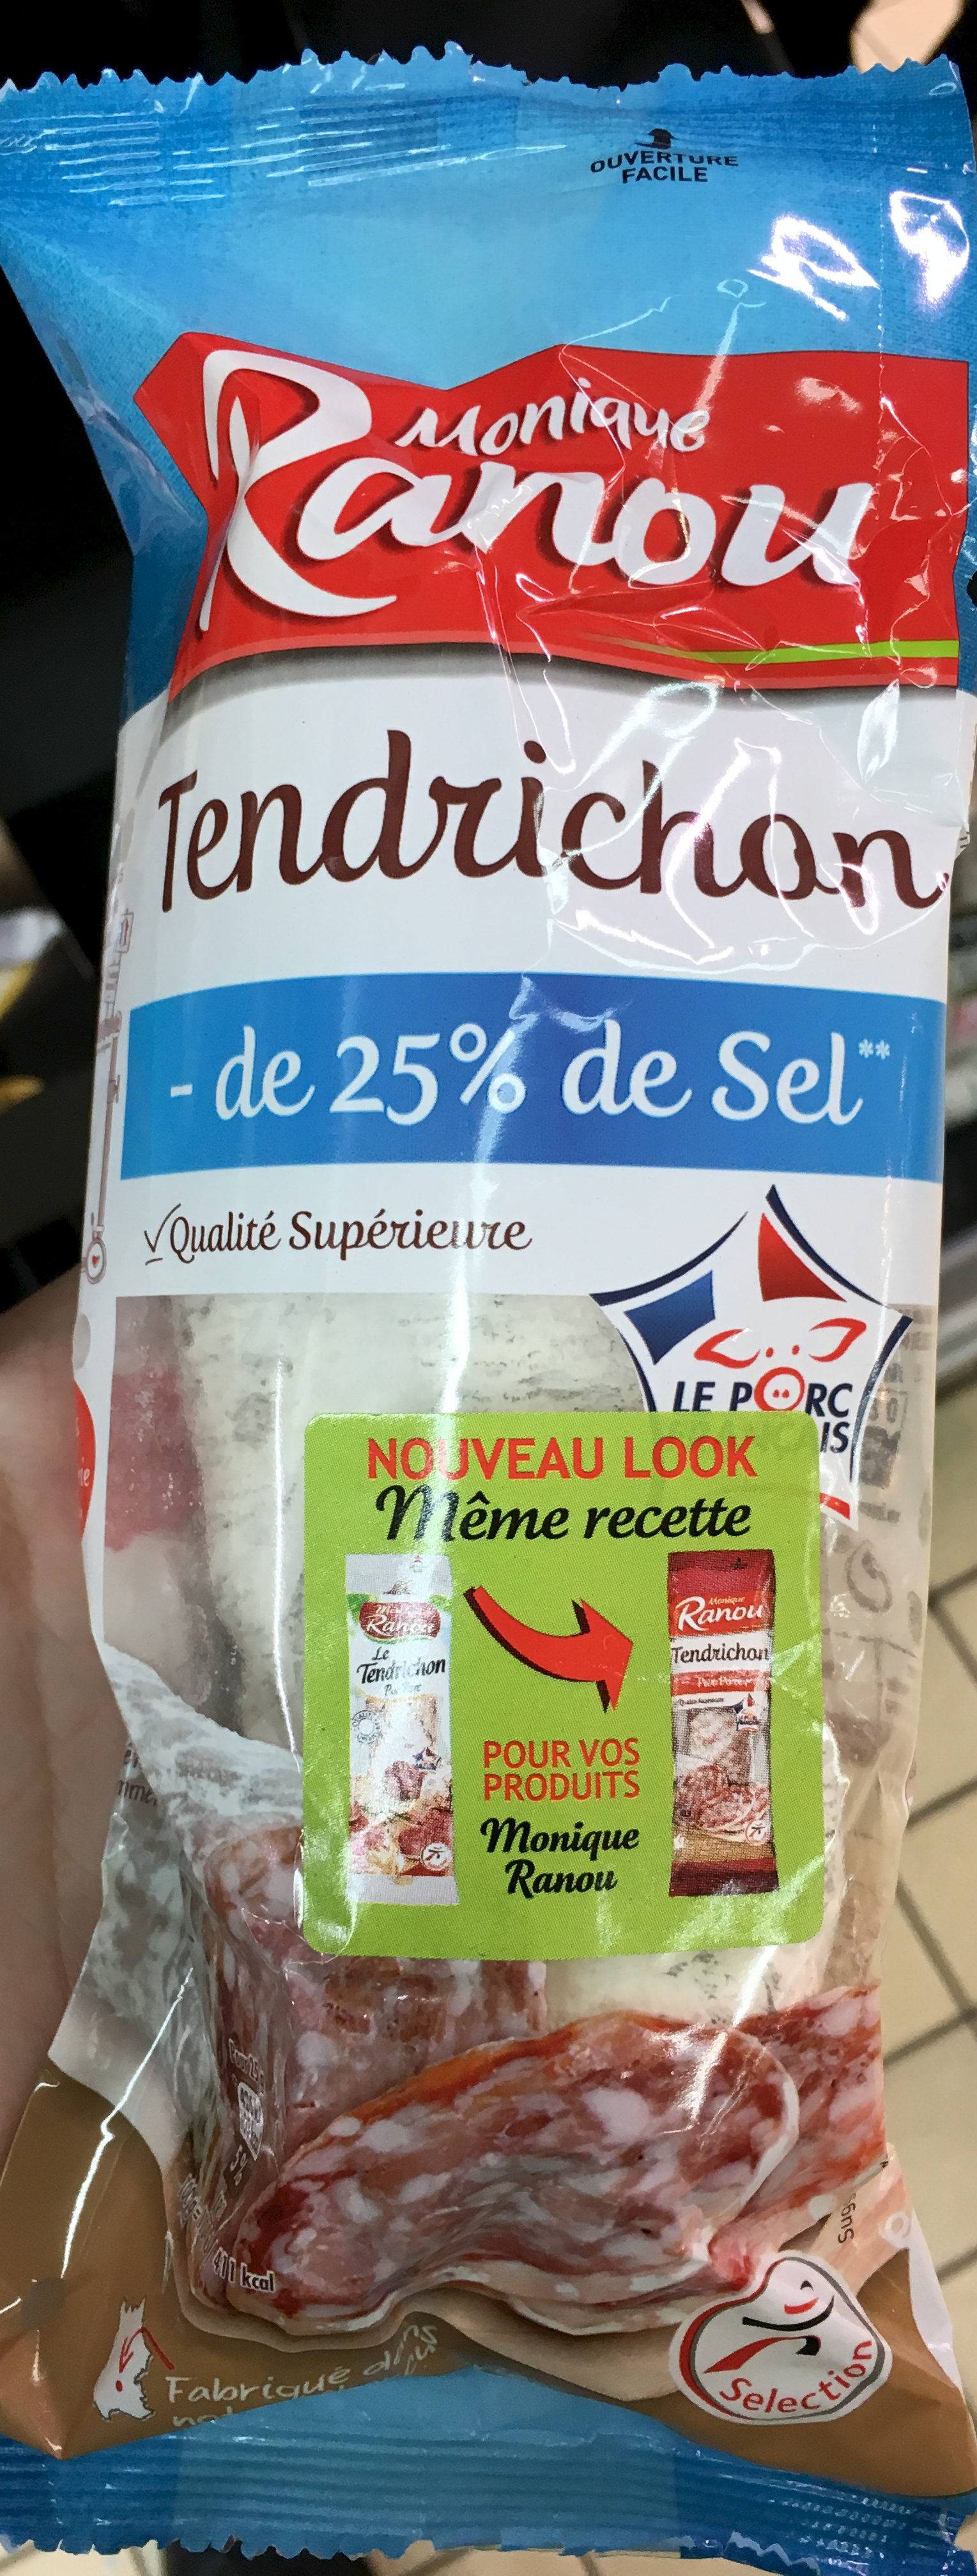 Tendrichon -25% de sel - Produit - fr